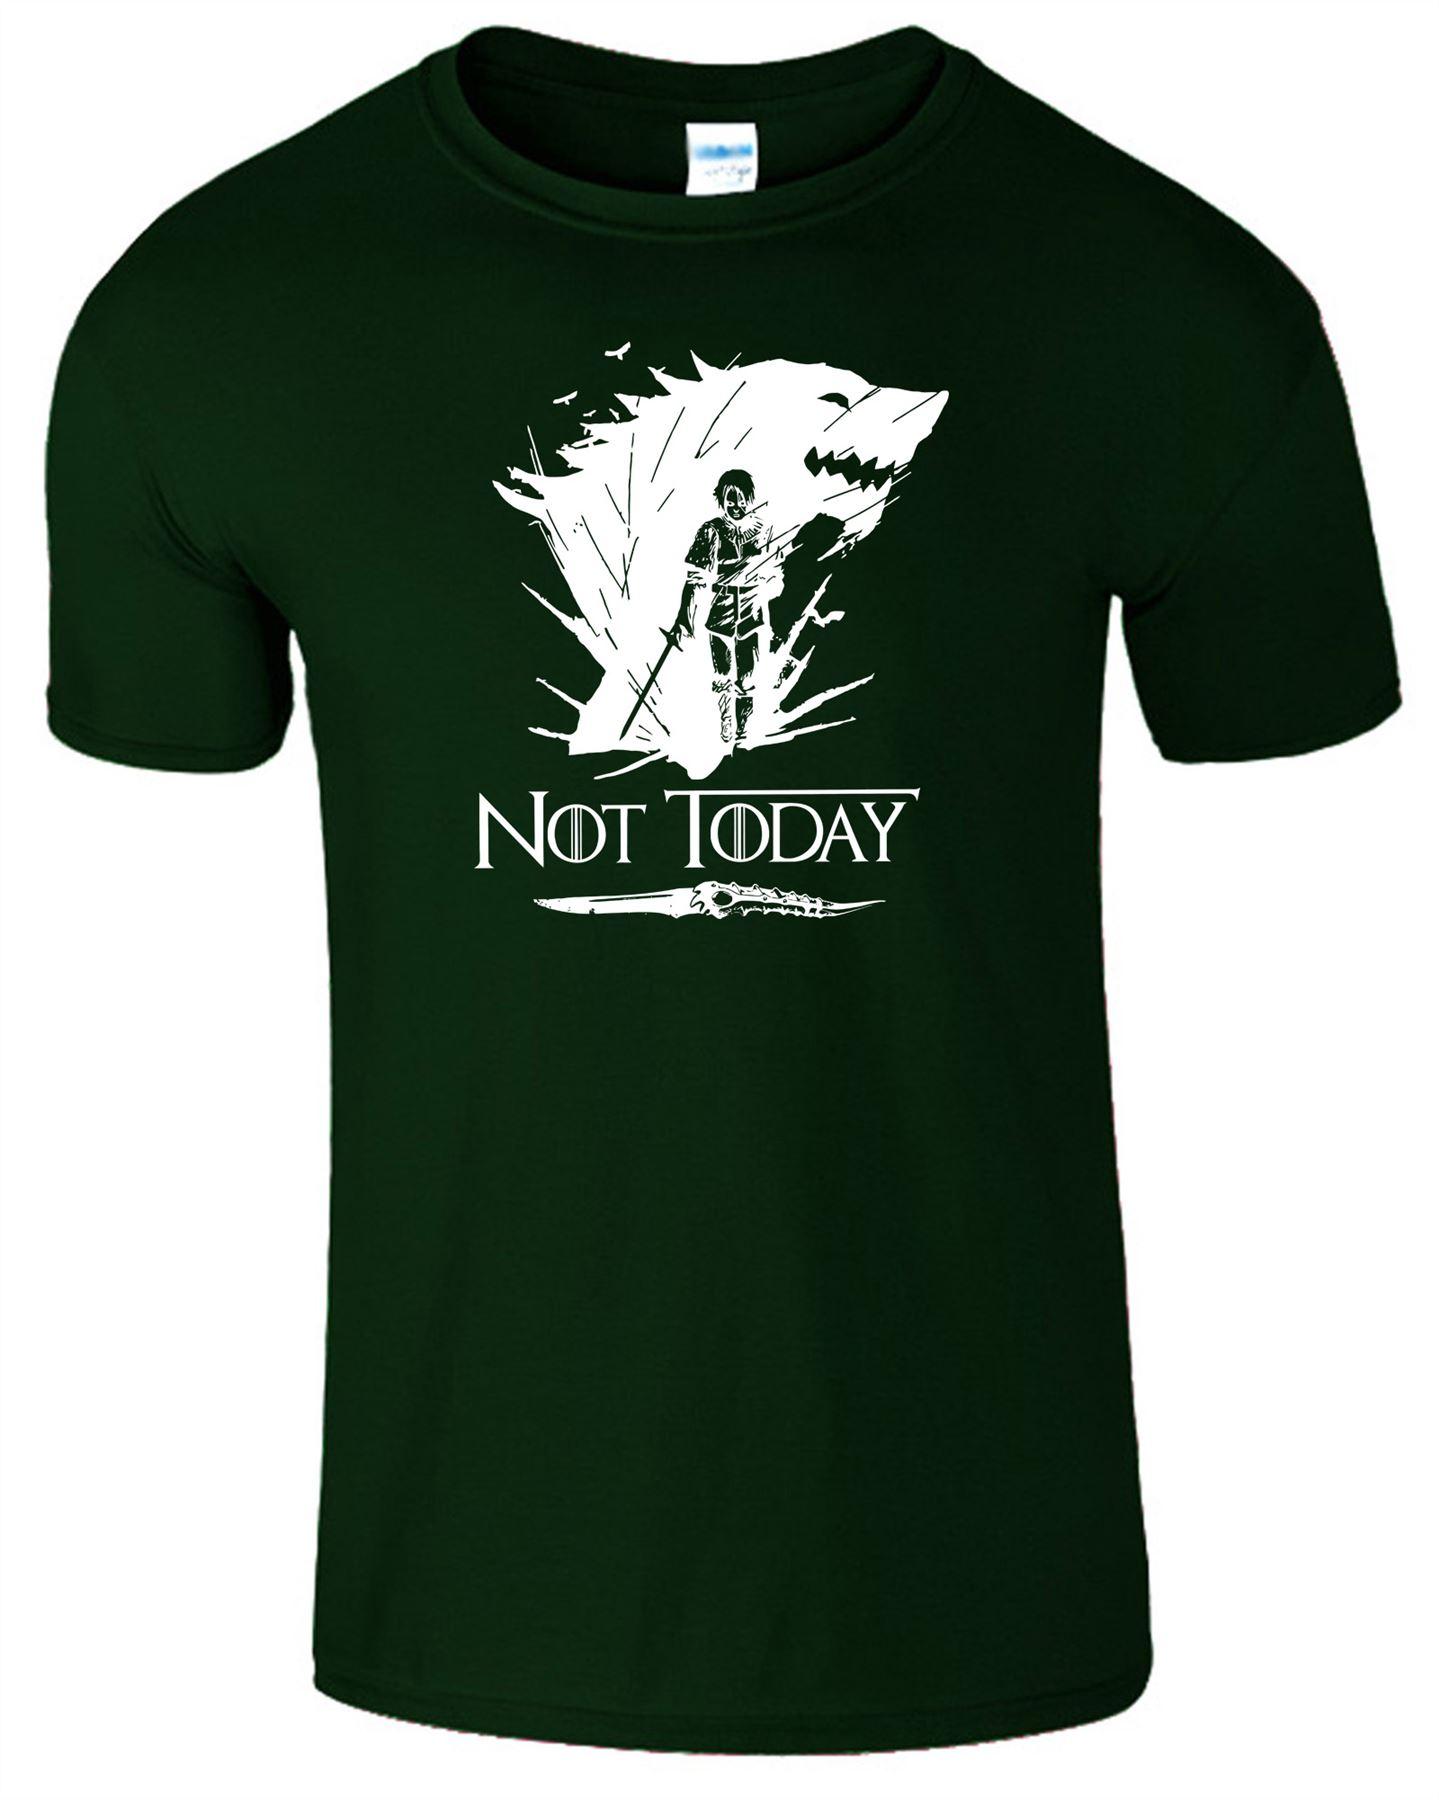 Arya-Stark-Not-Today-T-Shirt-Mens-Game-Season-Womens-Shirt-Adults-Unisex-Fit Indexbild 14